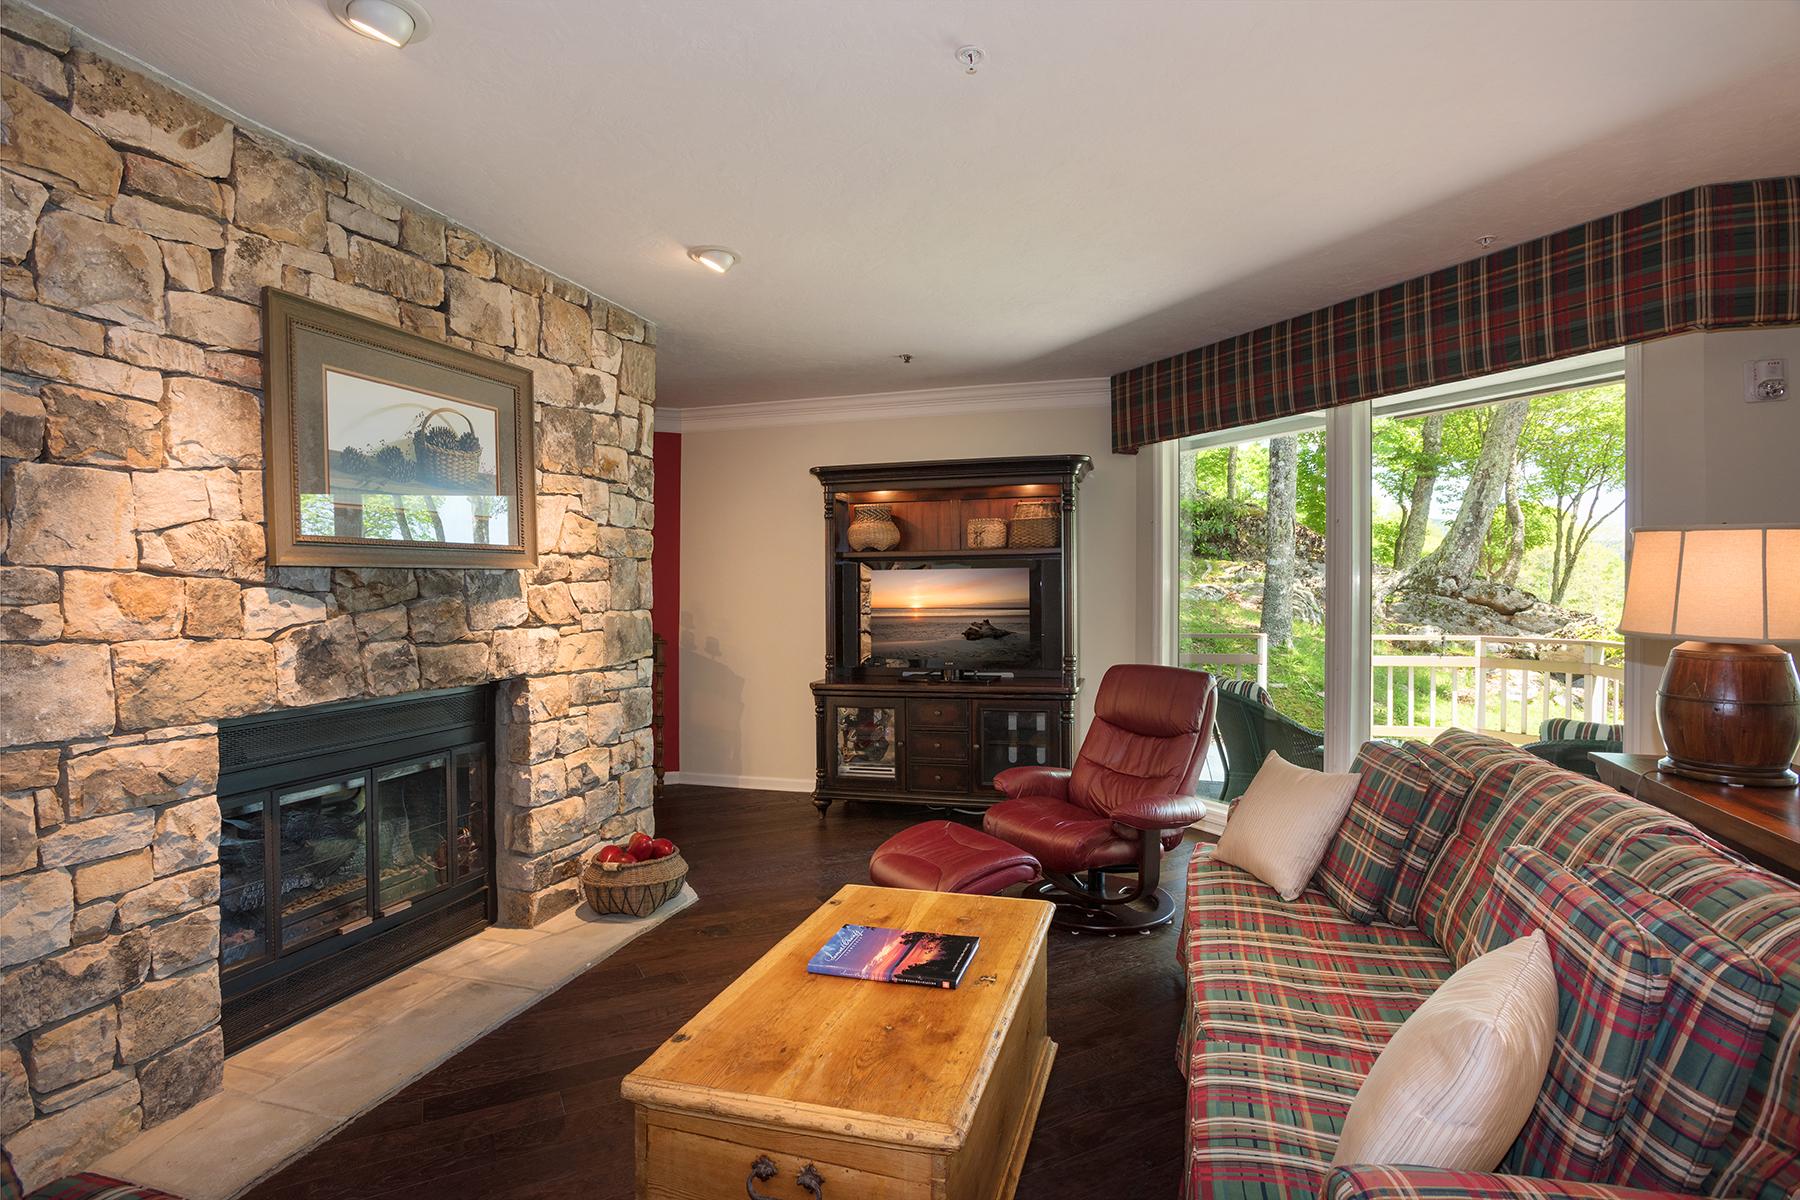 Condomínio para Venda às LINVILLE - LINVILLE RIDGE 103 Branlaire Drive Linville, Carolina Do Norte, 28646 Estados Unidos